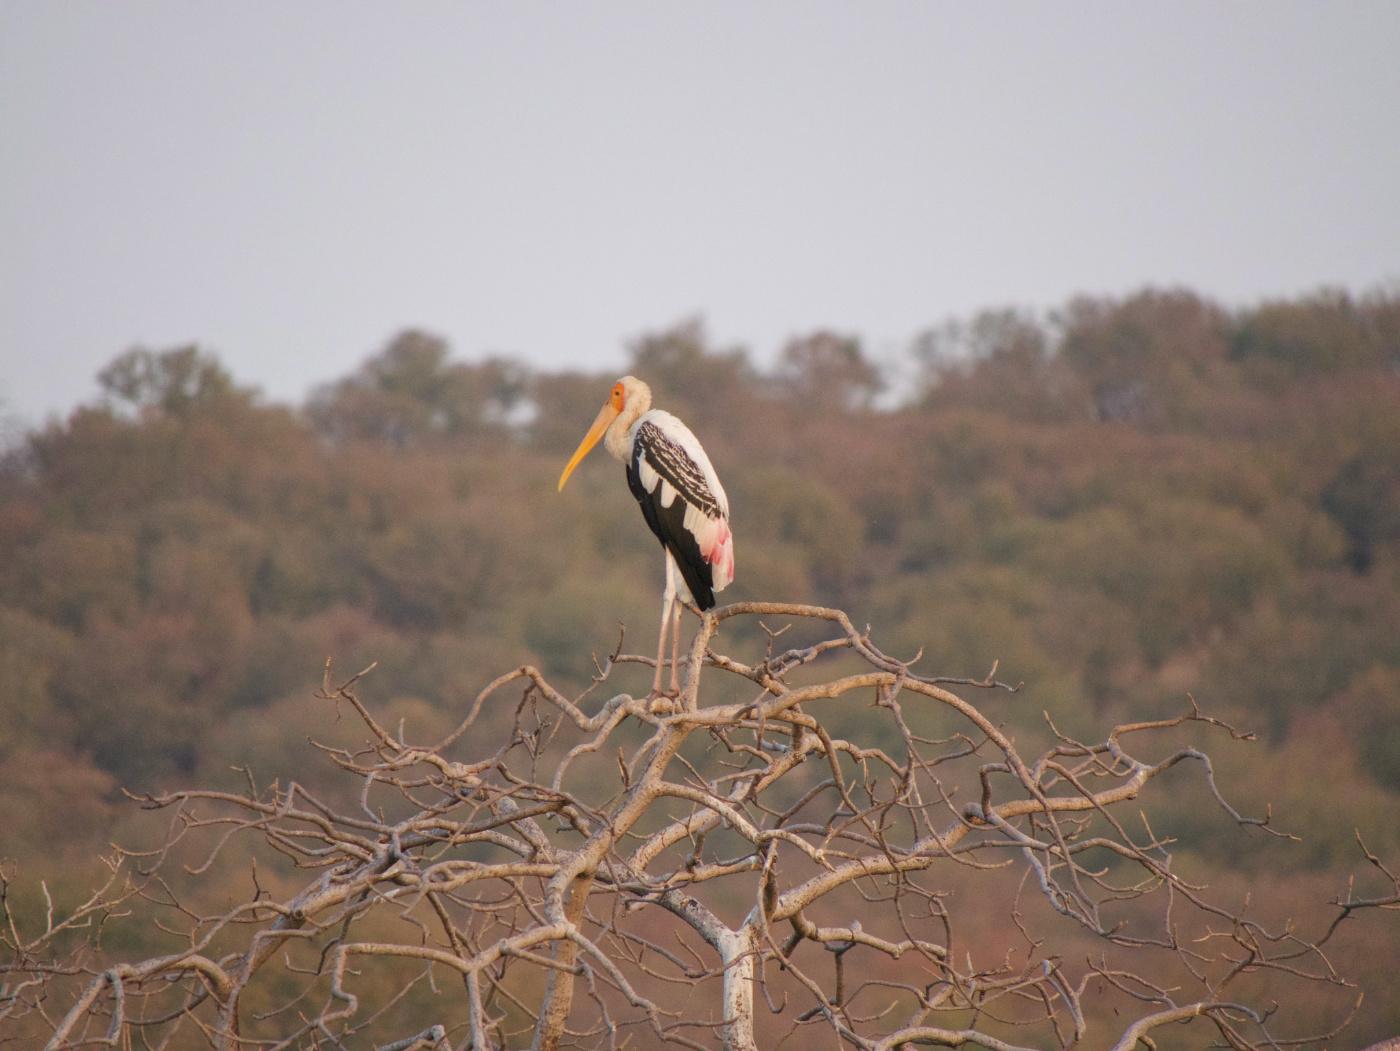 093-India-Ranthambore